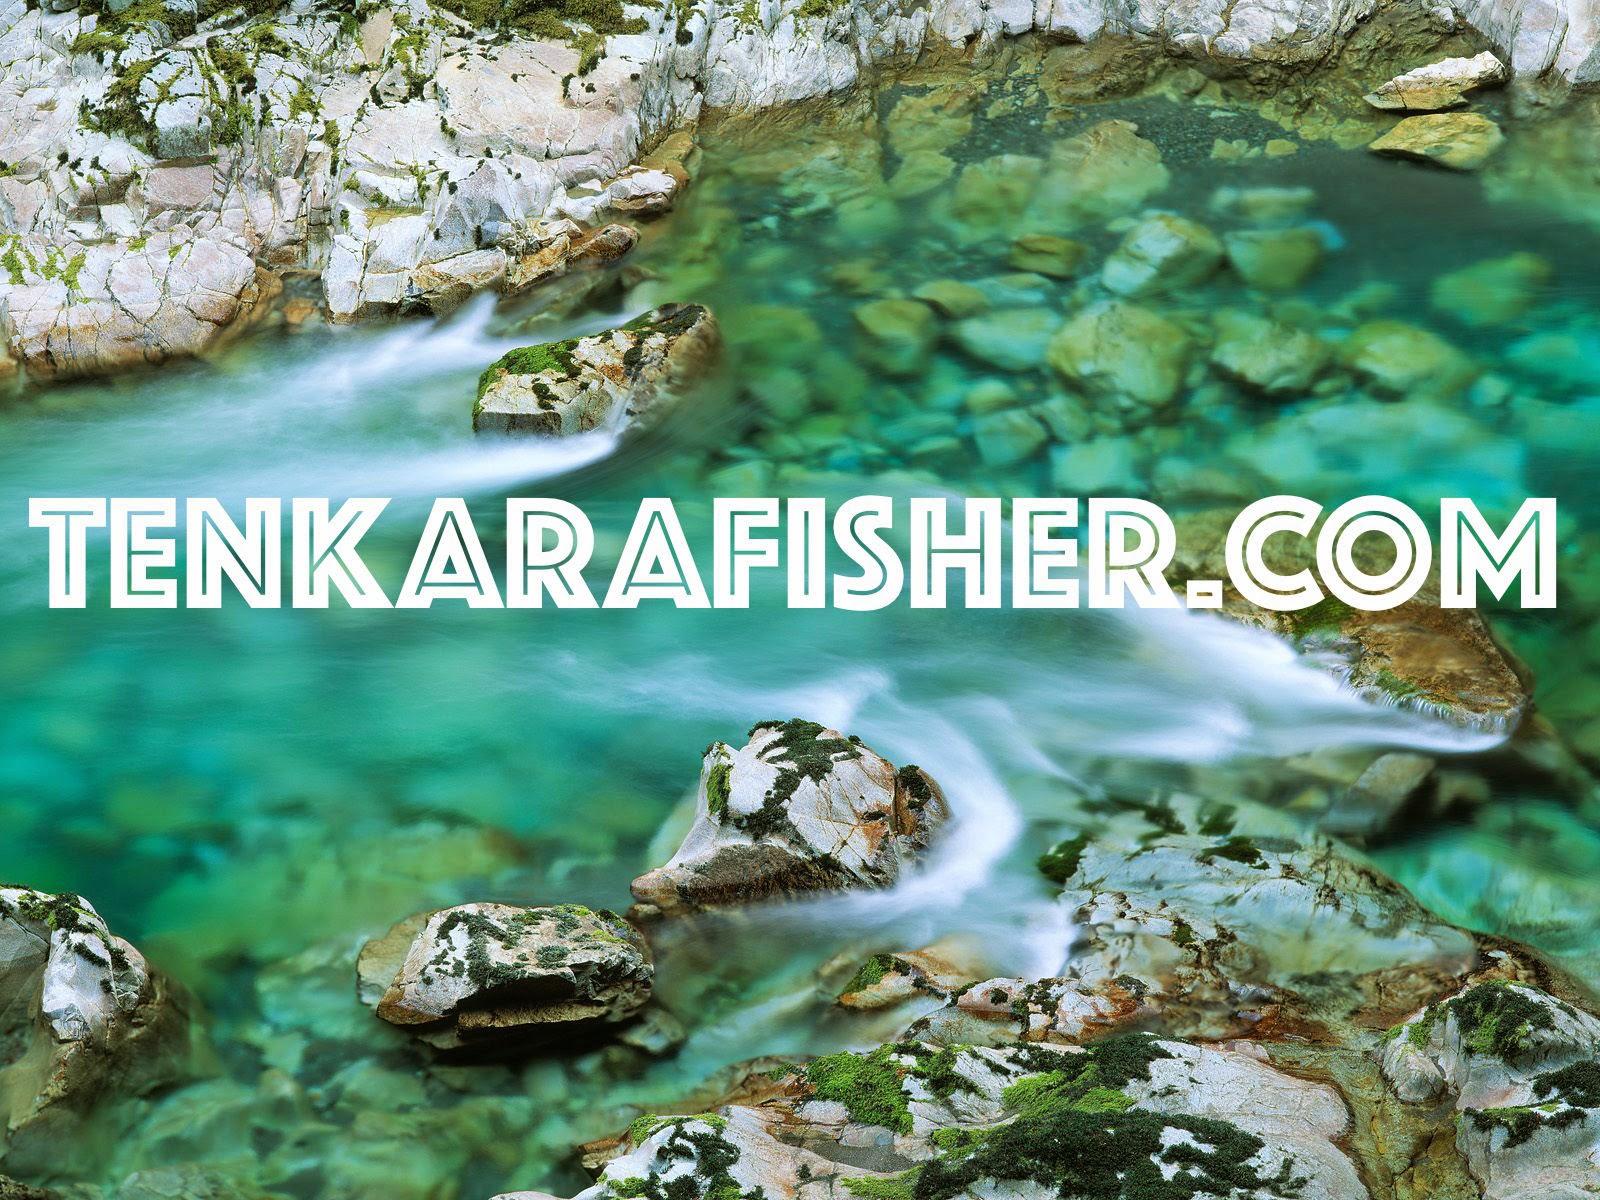 TENKARA FISHER FORUM